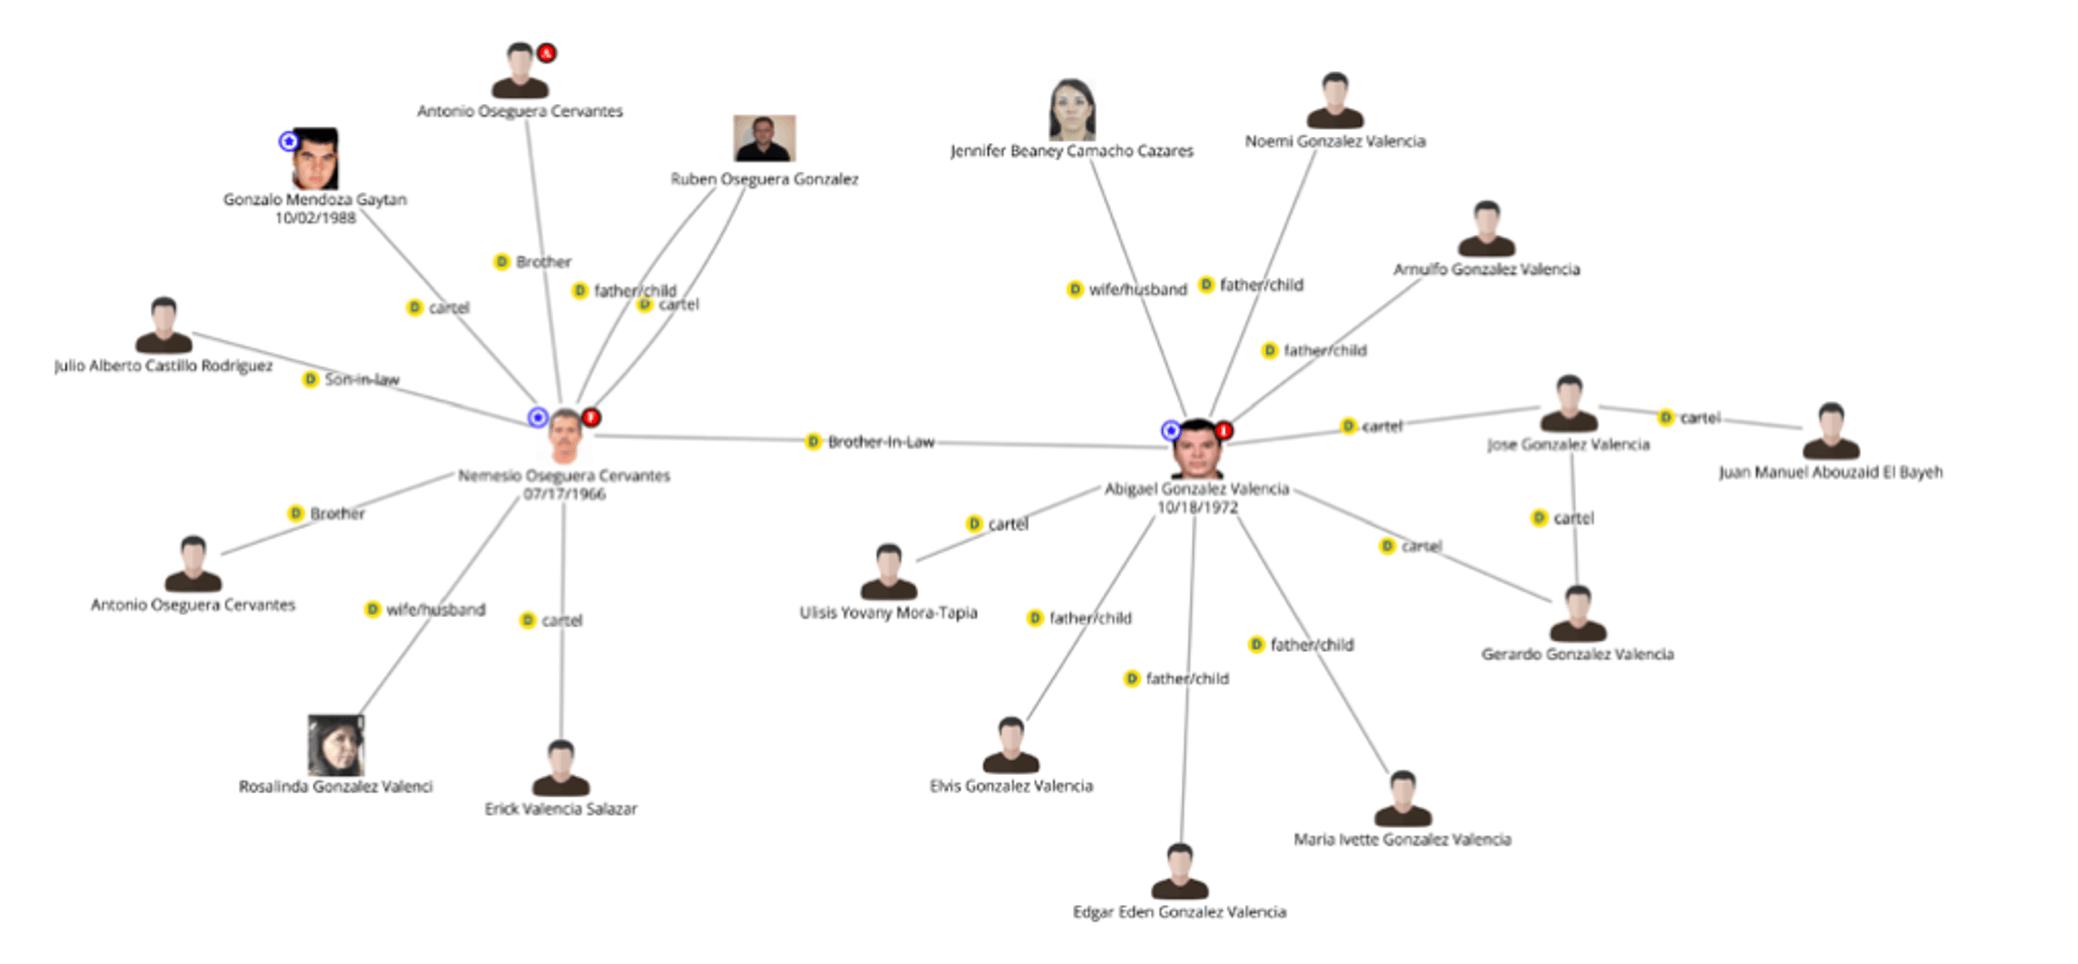 Figure 6. Extending the link analysis